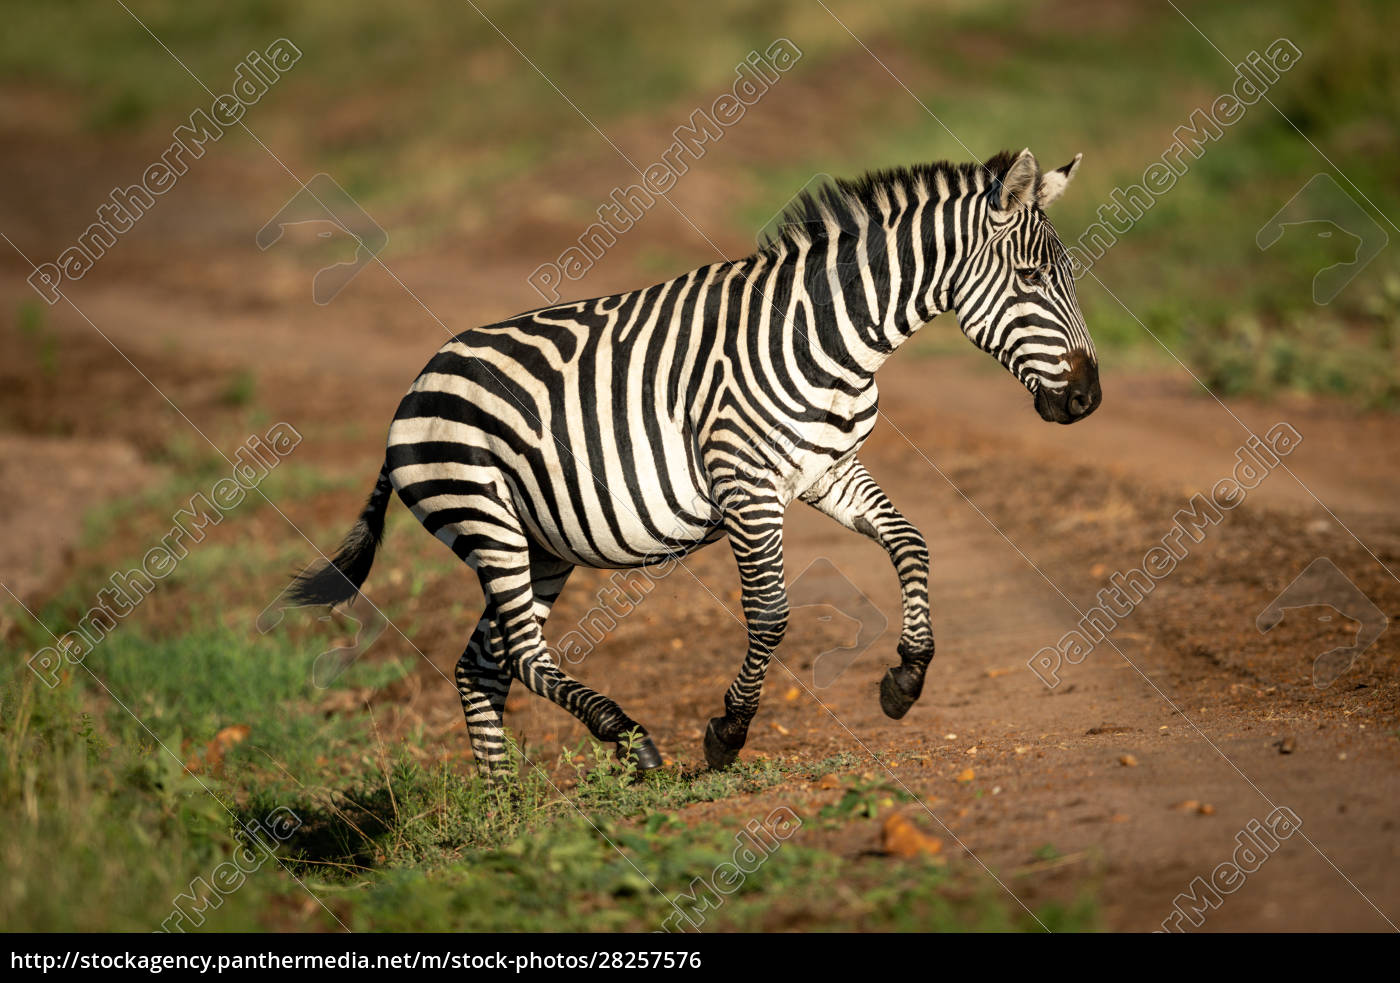 plains, zebra, jumps, over, ditch, beside - 28257576